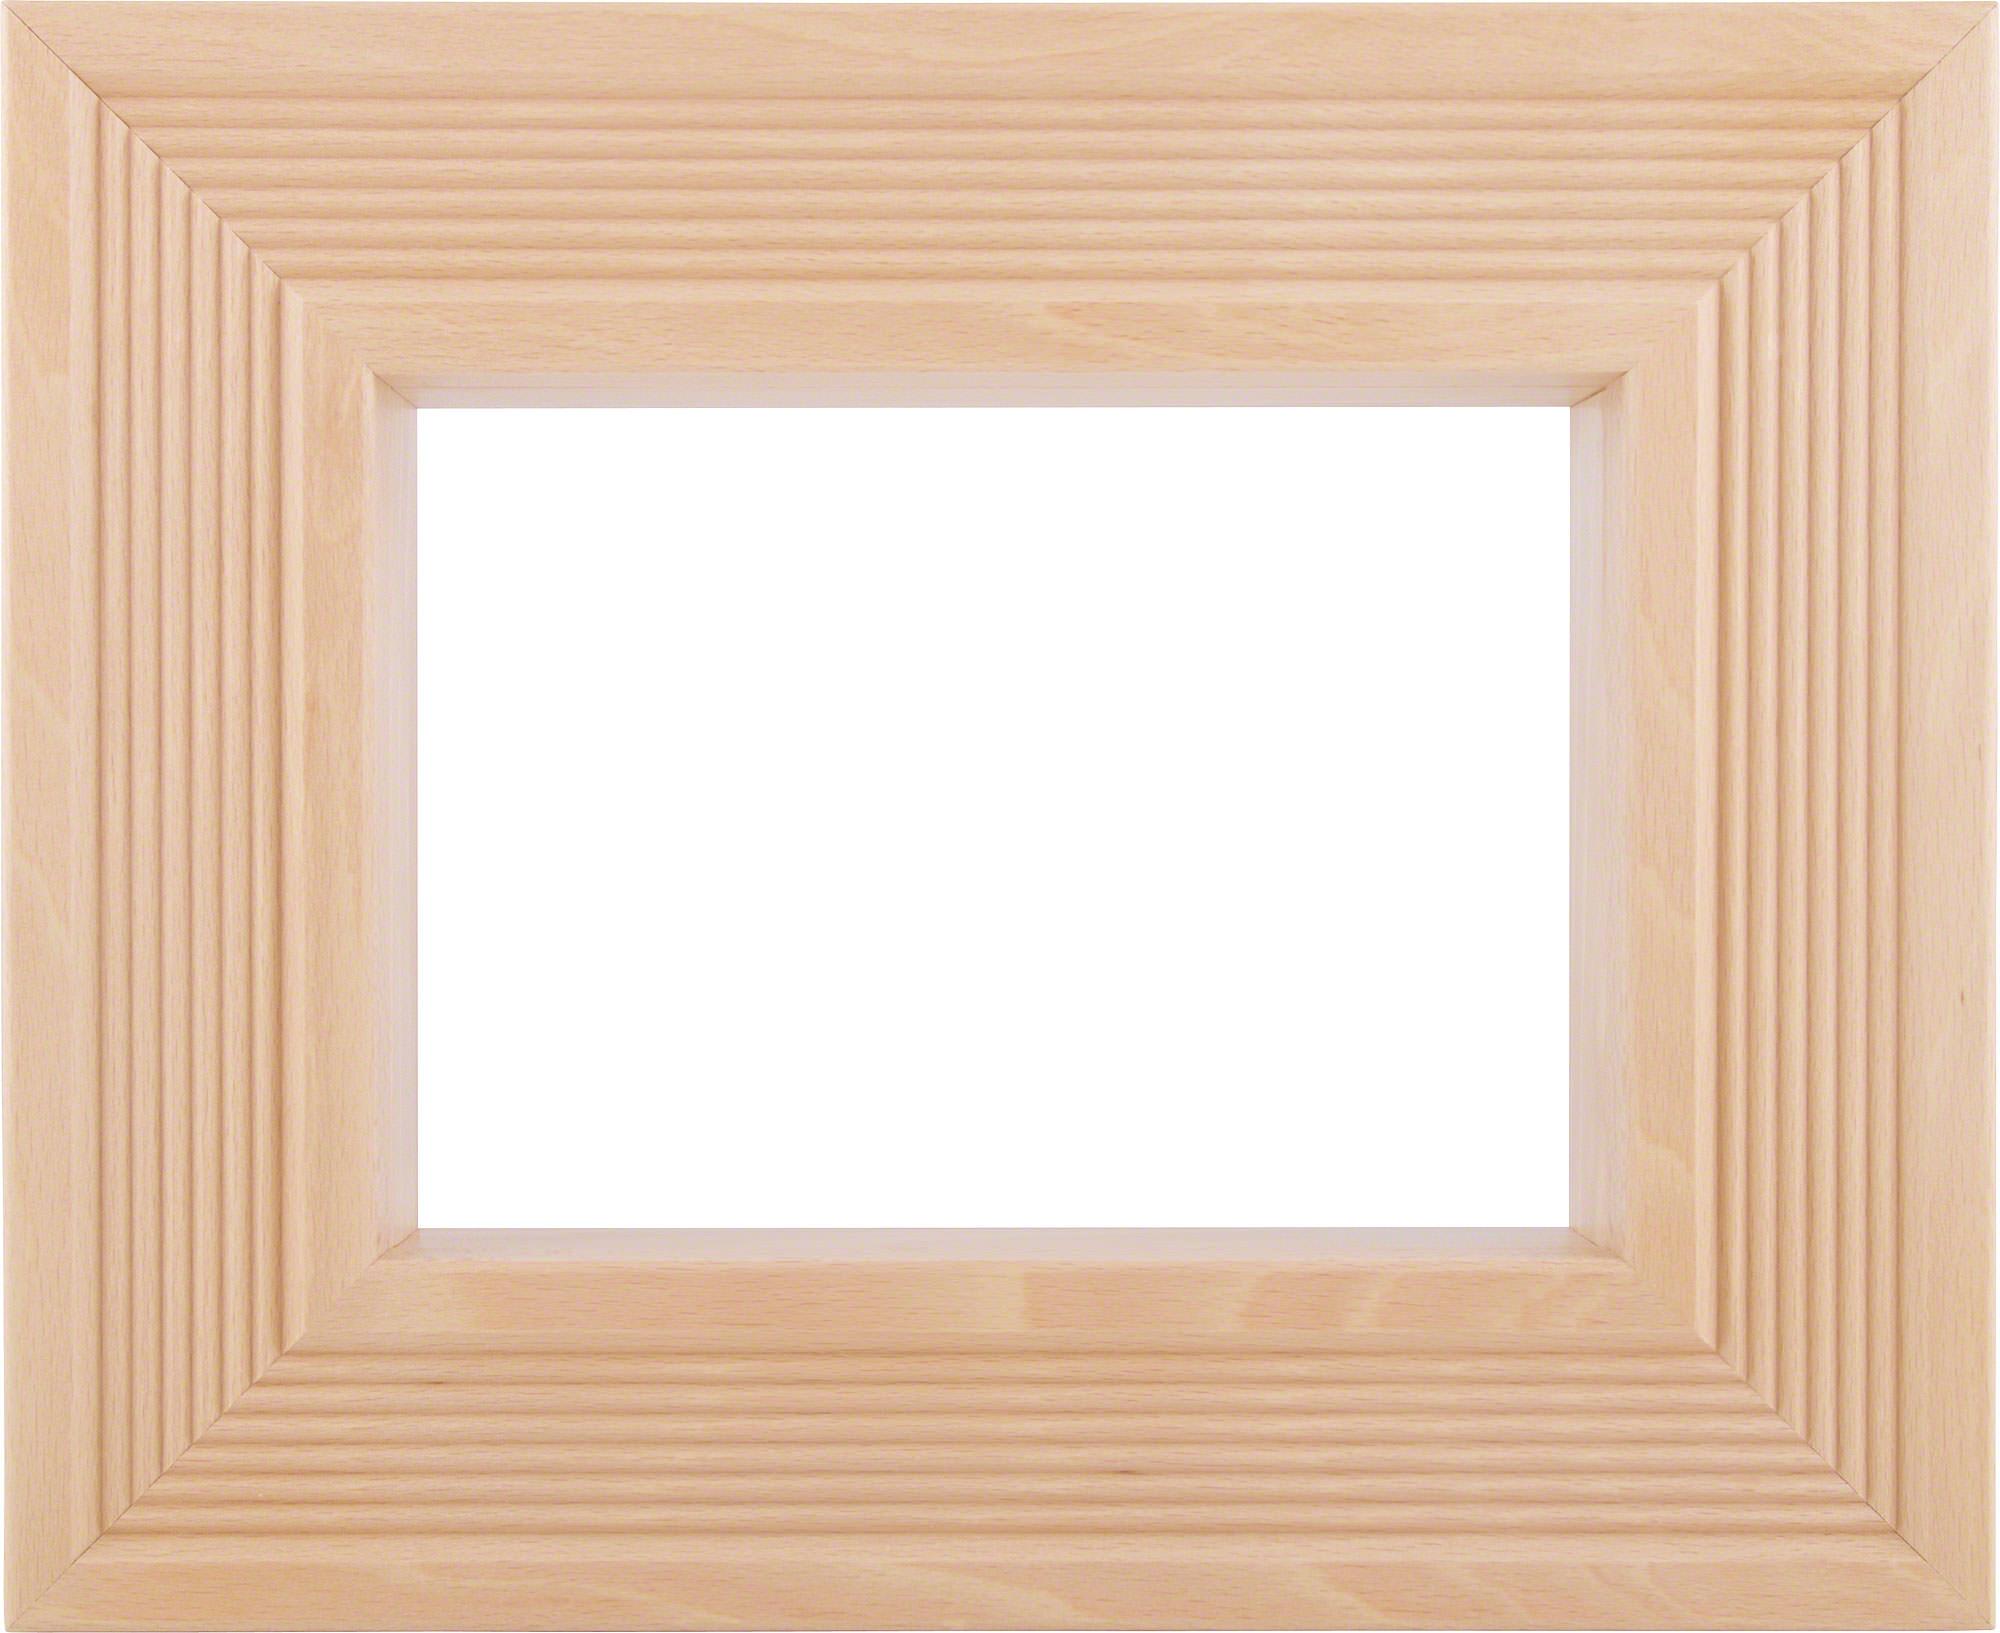 rahmen f r kantenhocker 33 cmx27 cmx8 cm farbe natur von kwo. Black Bedroom Furniture Sets. Home Design Ideas